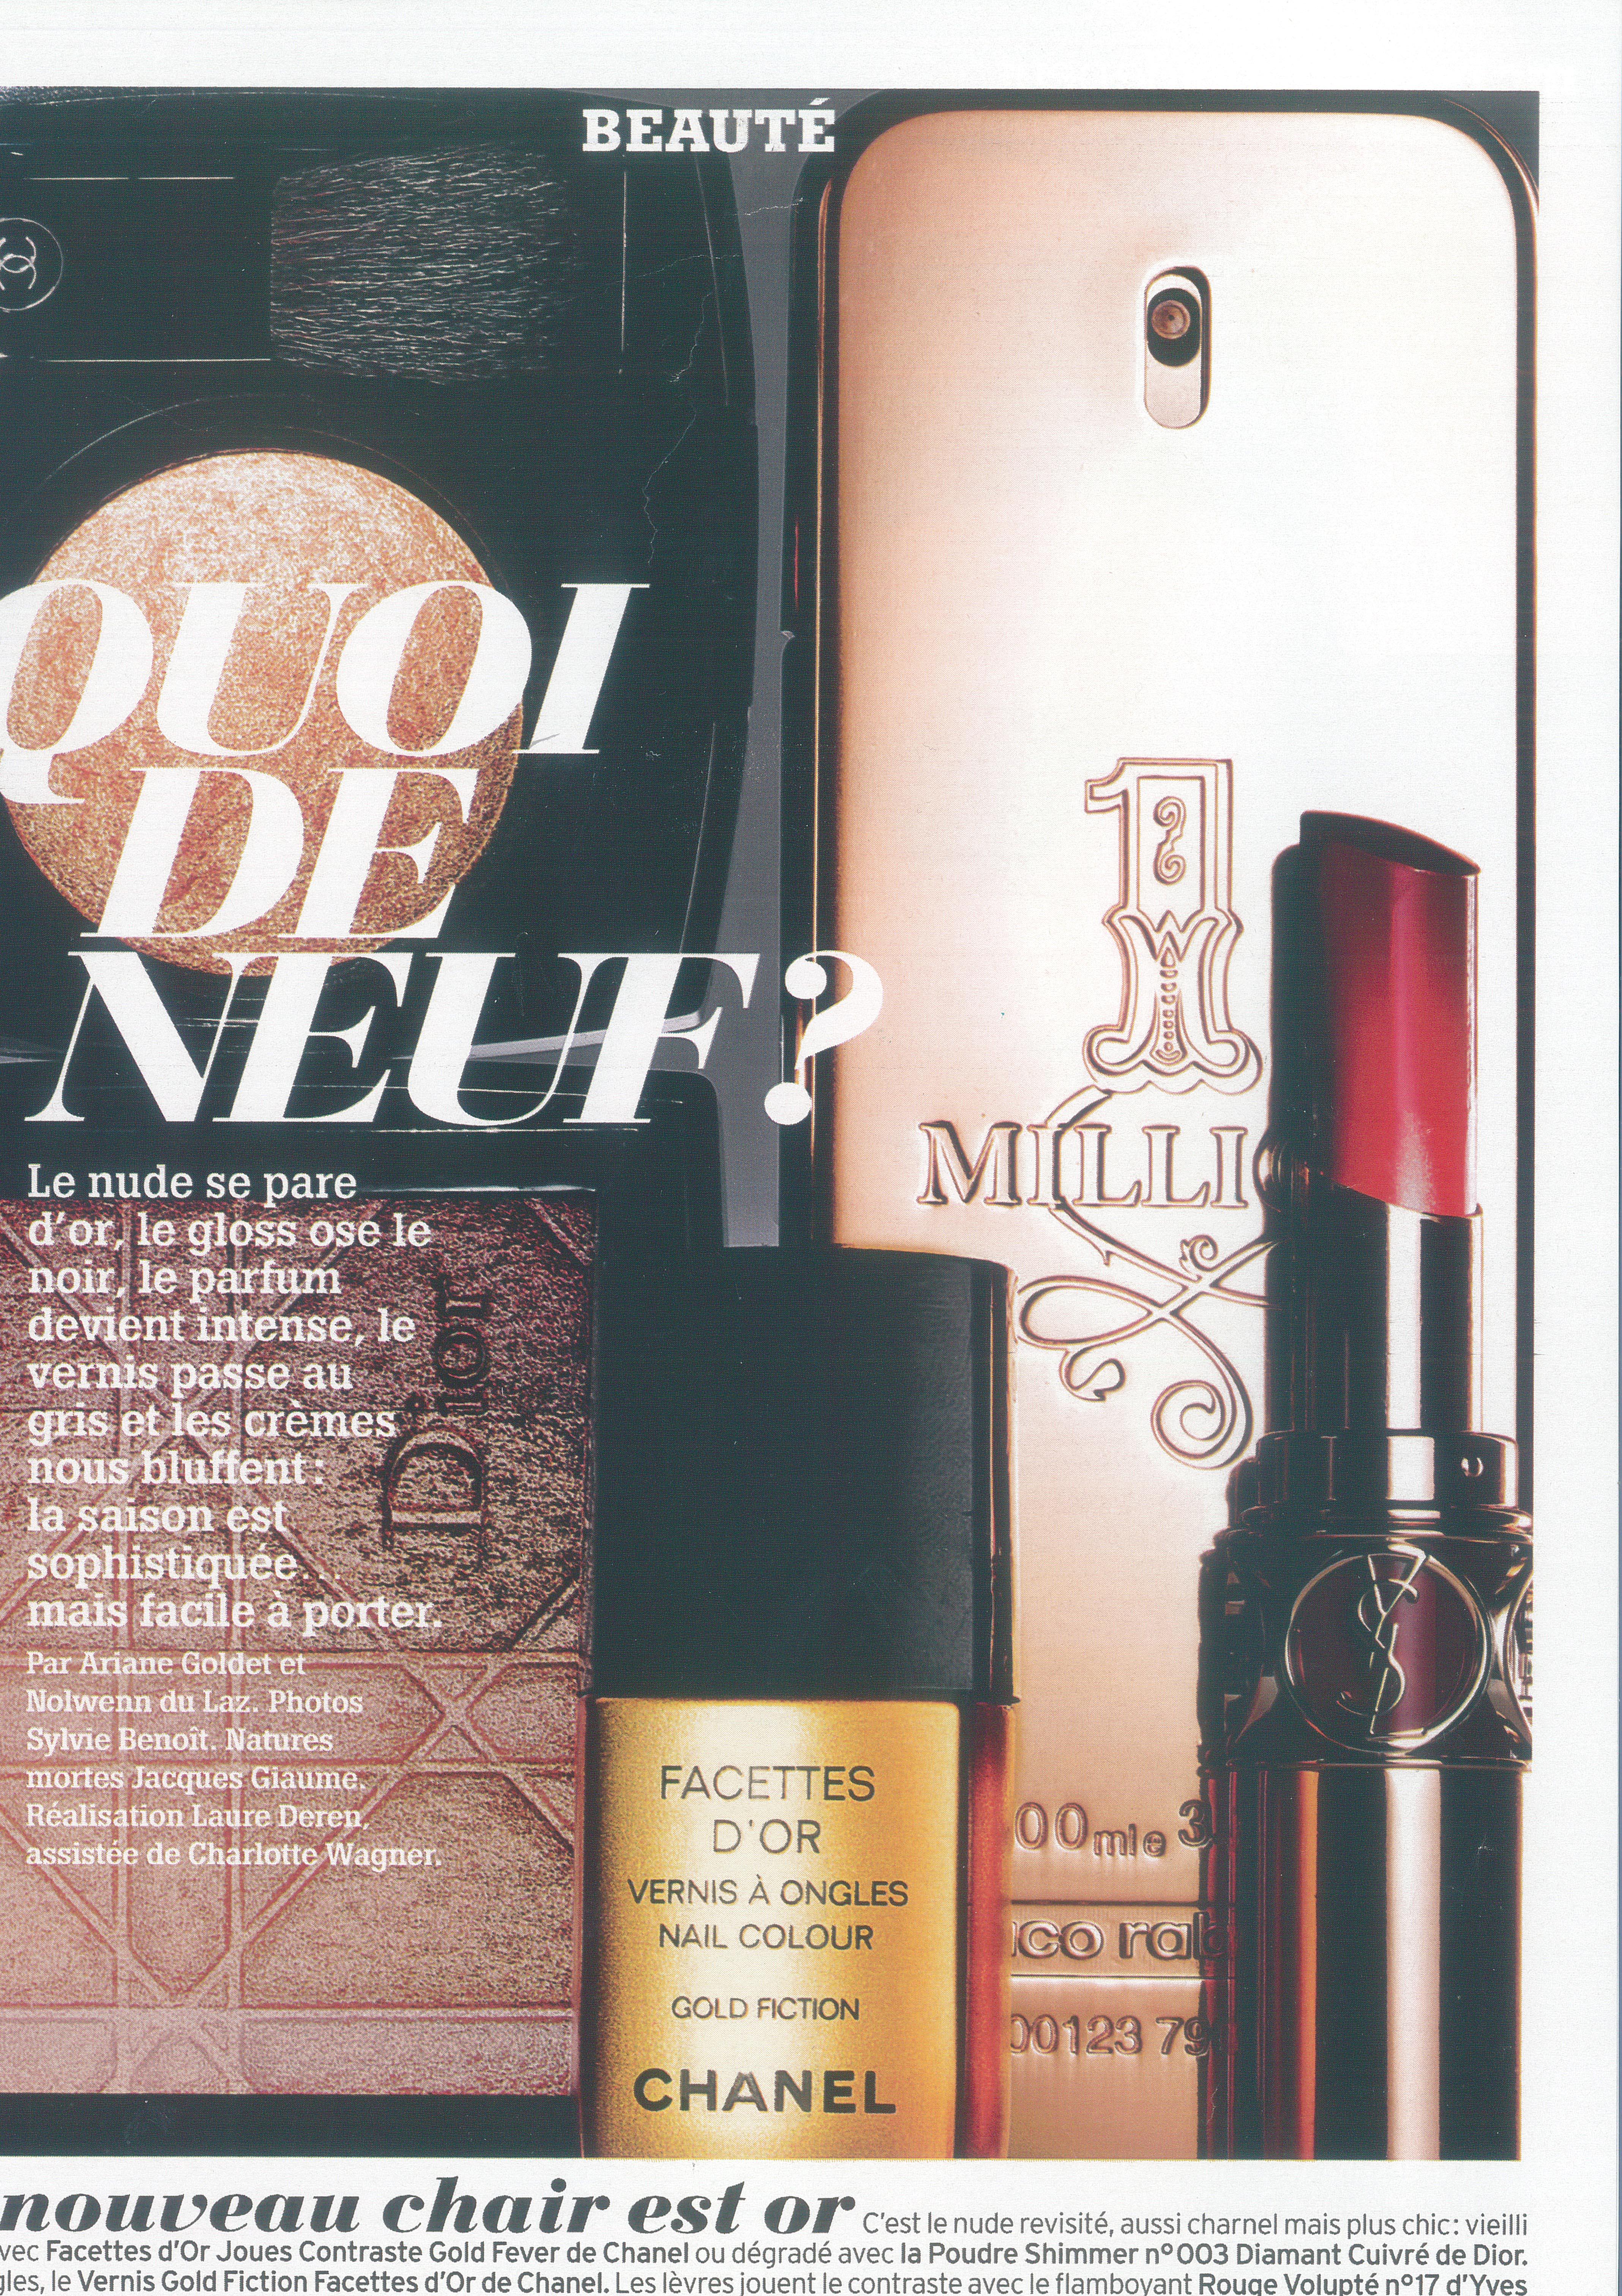 cbf49544cdcf ... le figaro magazine august 2008 drupalimage(s) ...